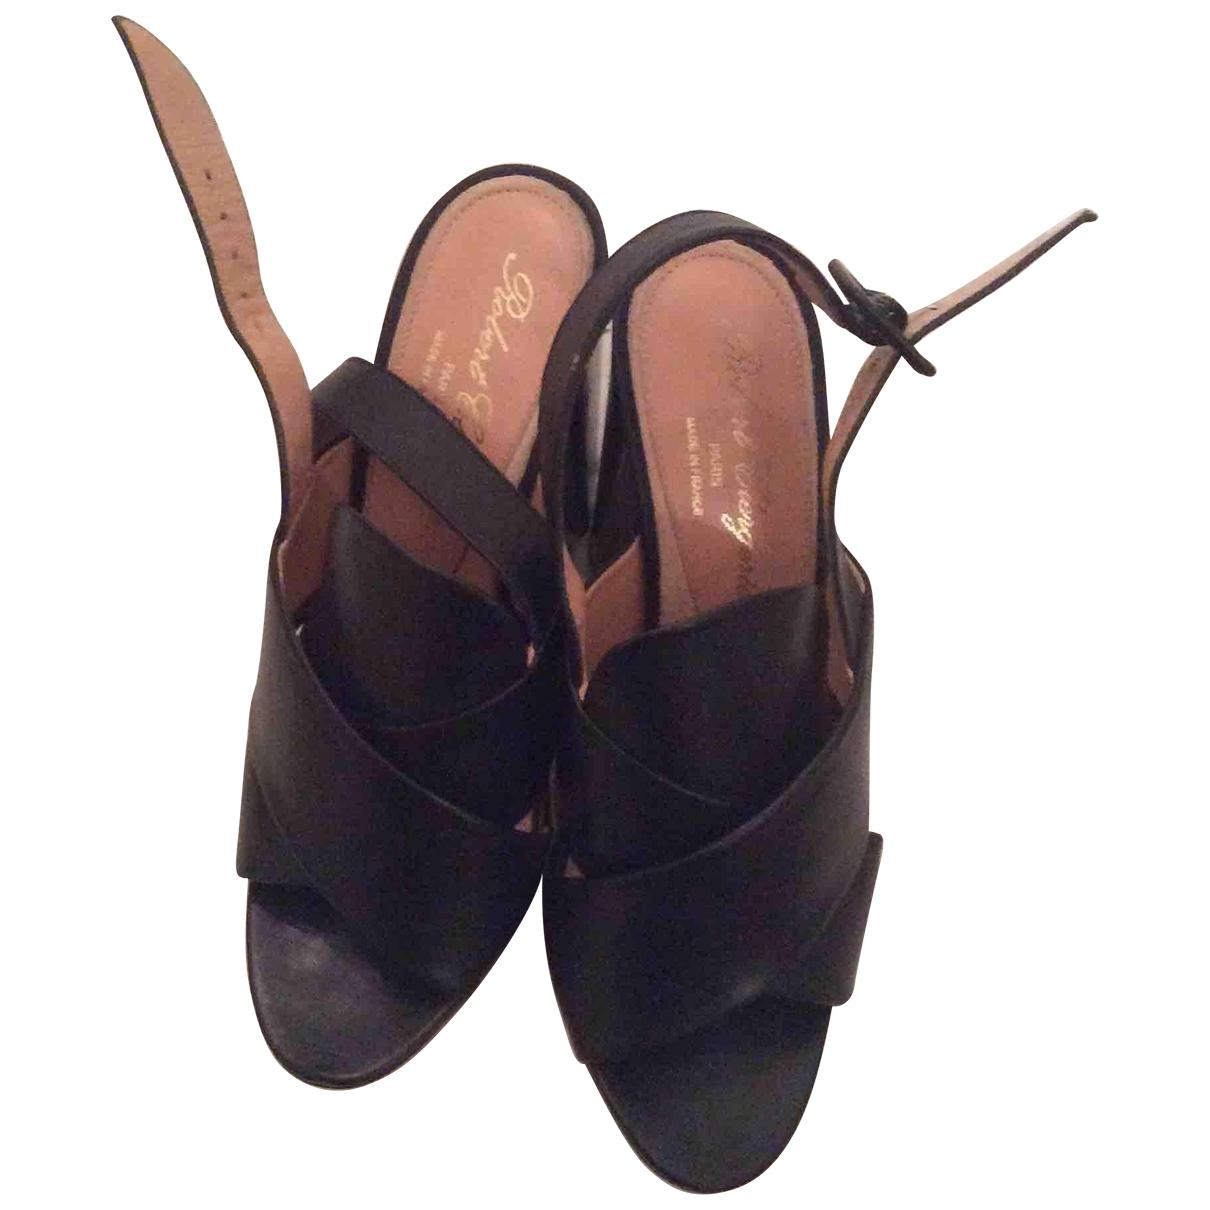 Sandalias de Cuero Robert Clergerie